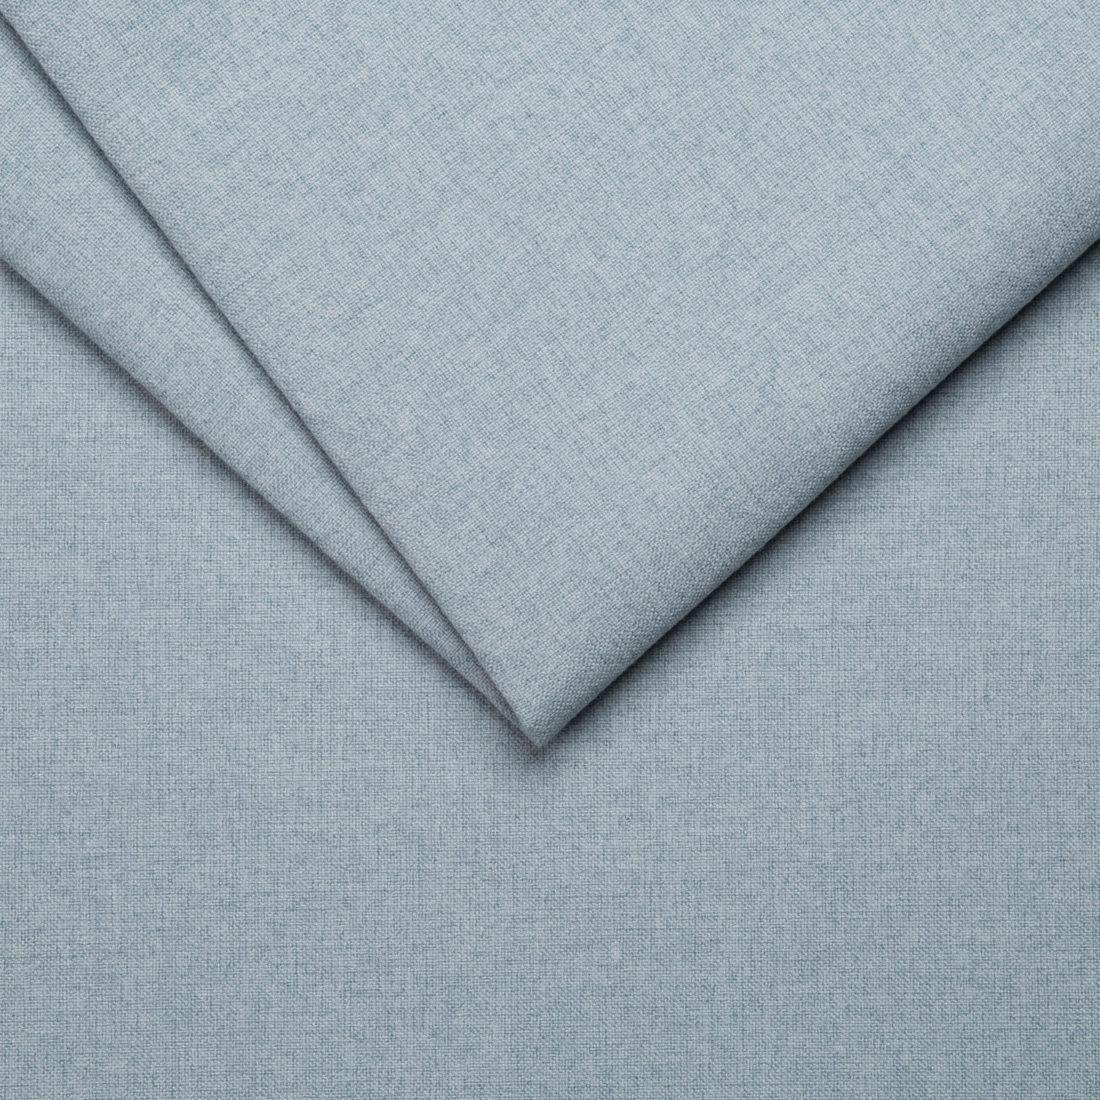 Меблева тканина Cashmere 10 Pastel Blue, рогожка